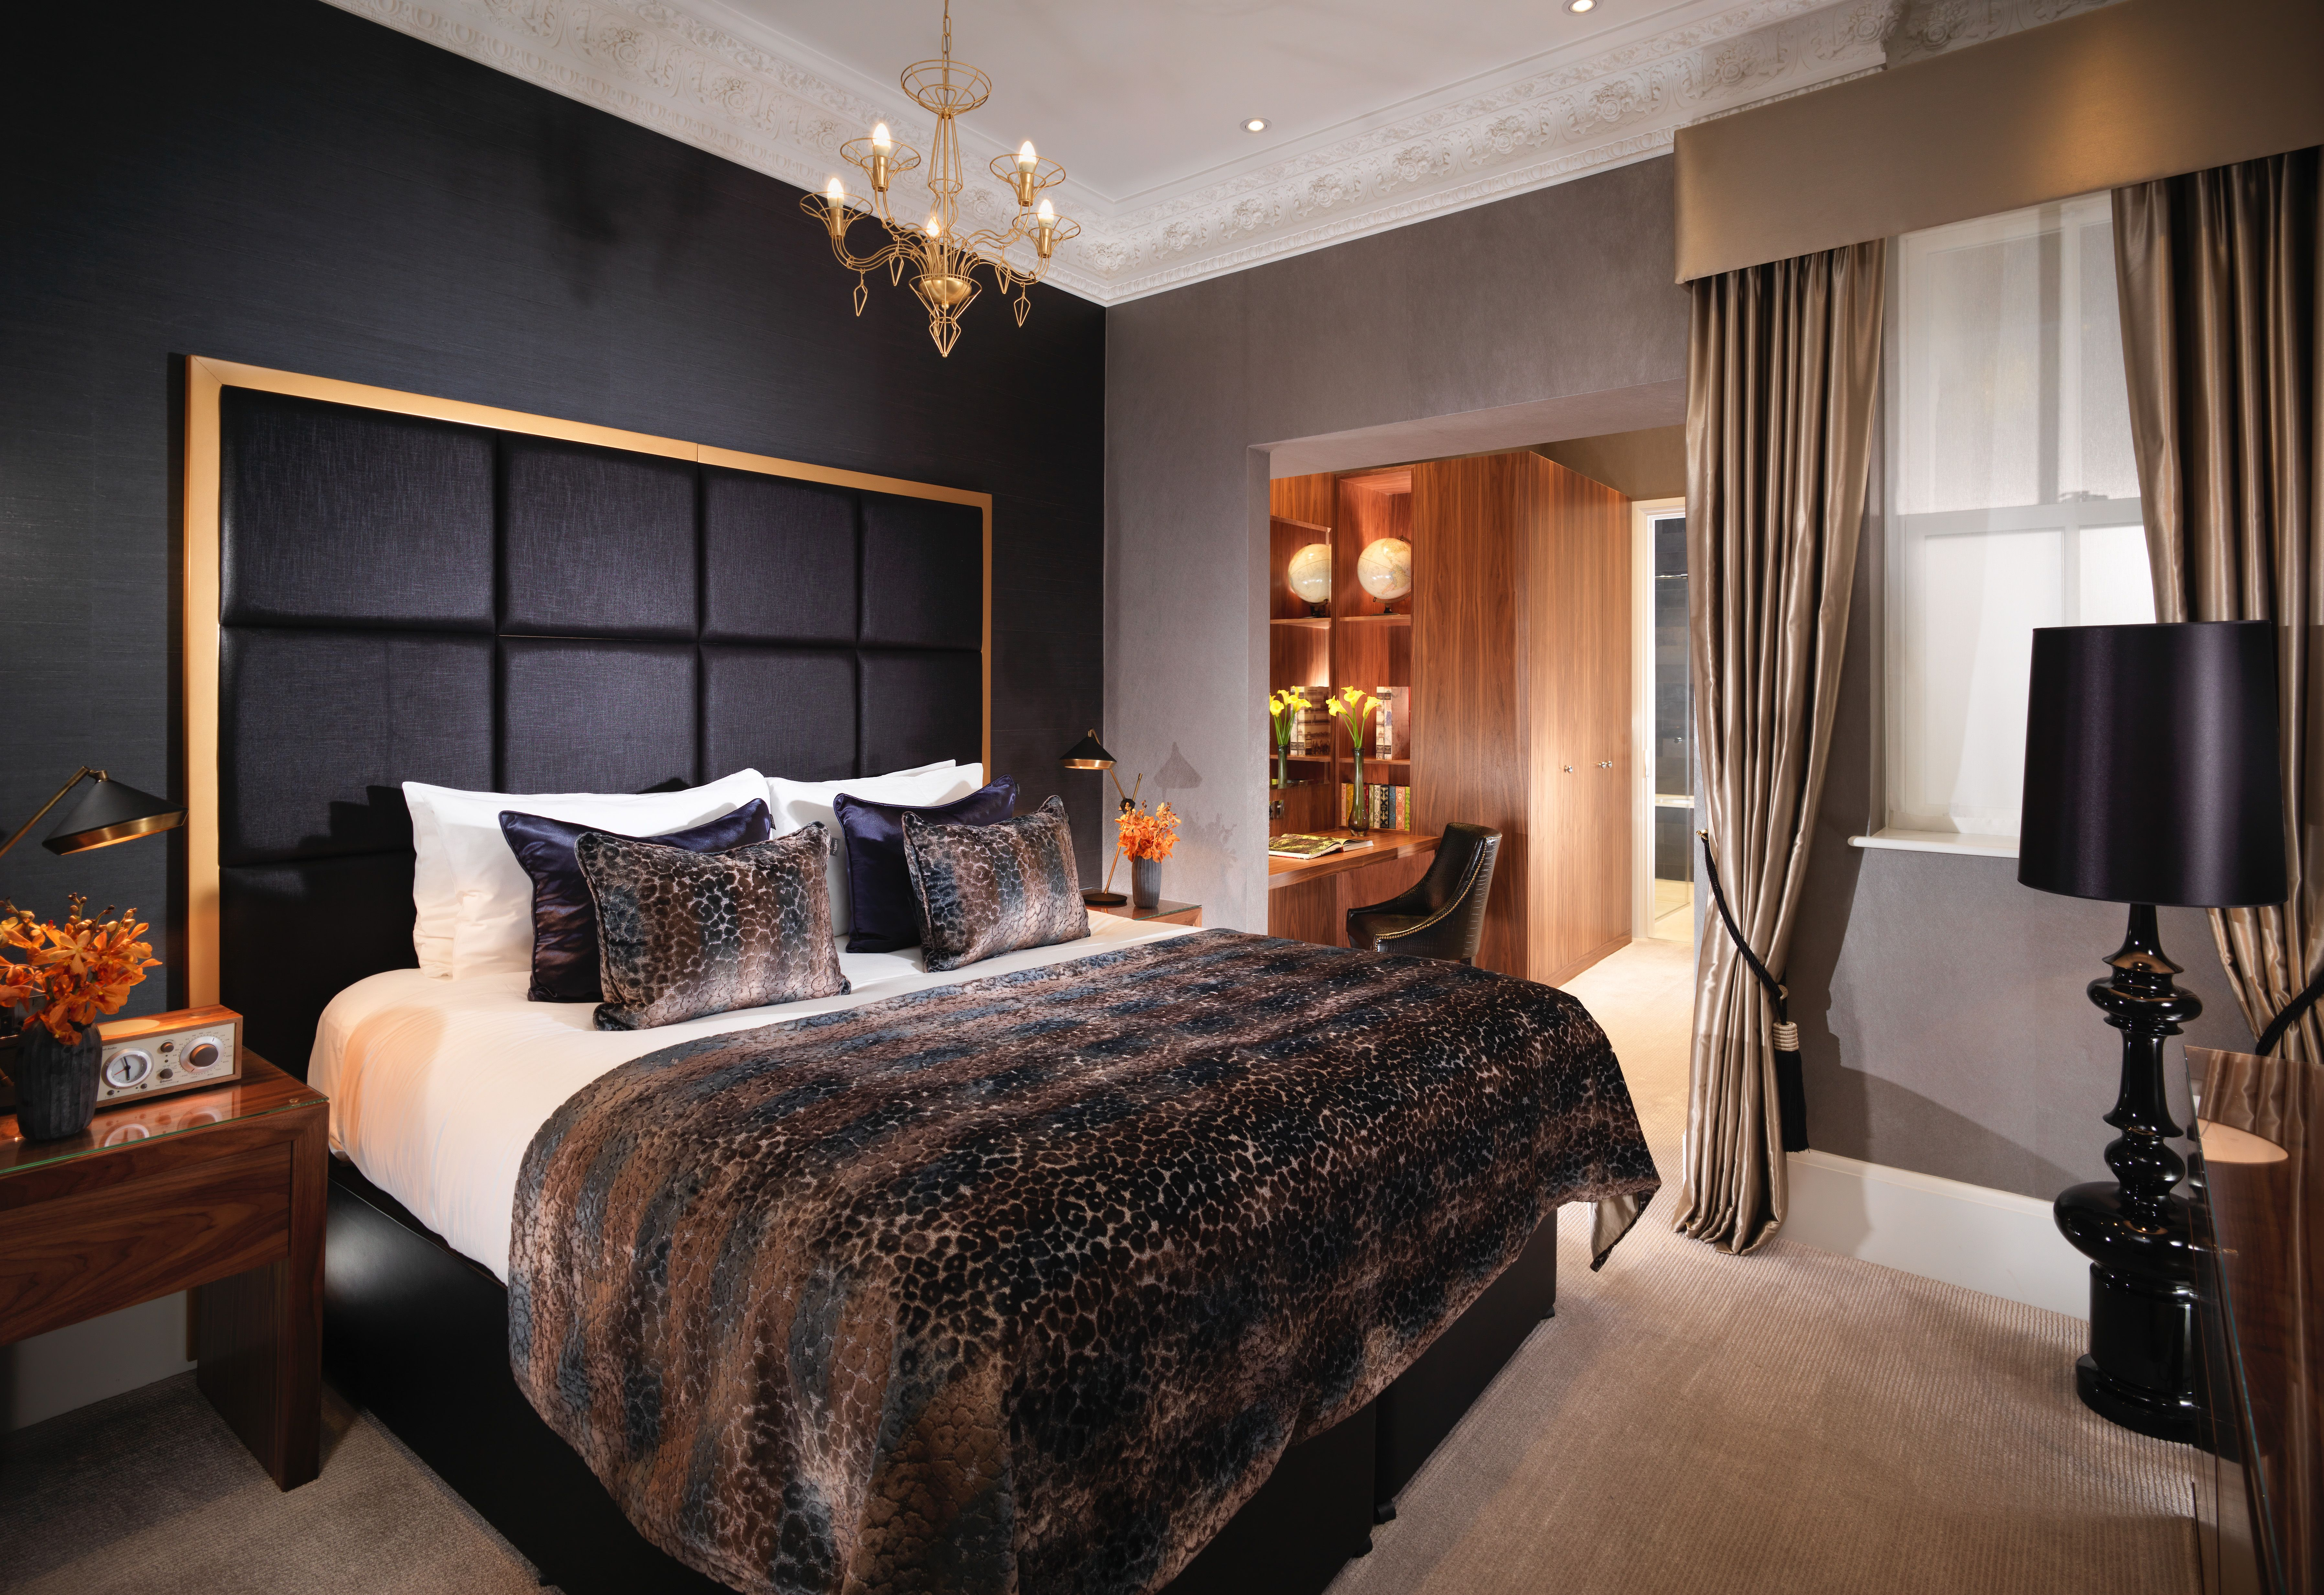 flemings mayfair, london - luxury serviced apartments | interior